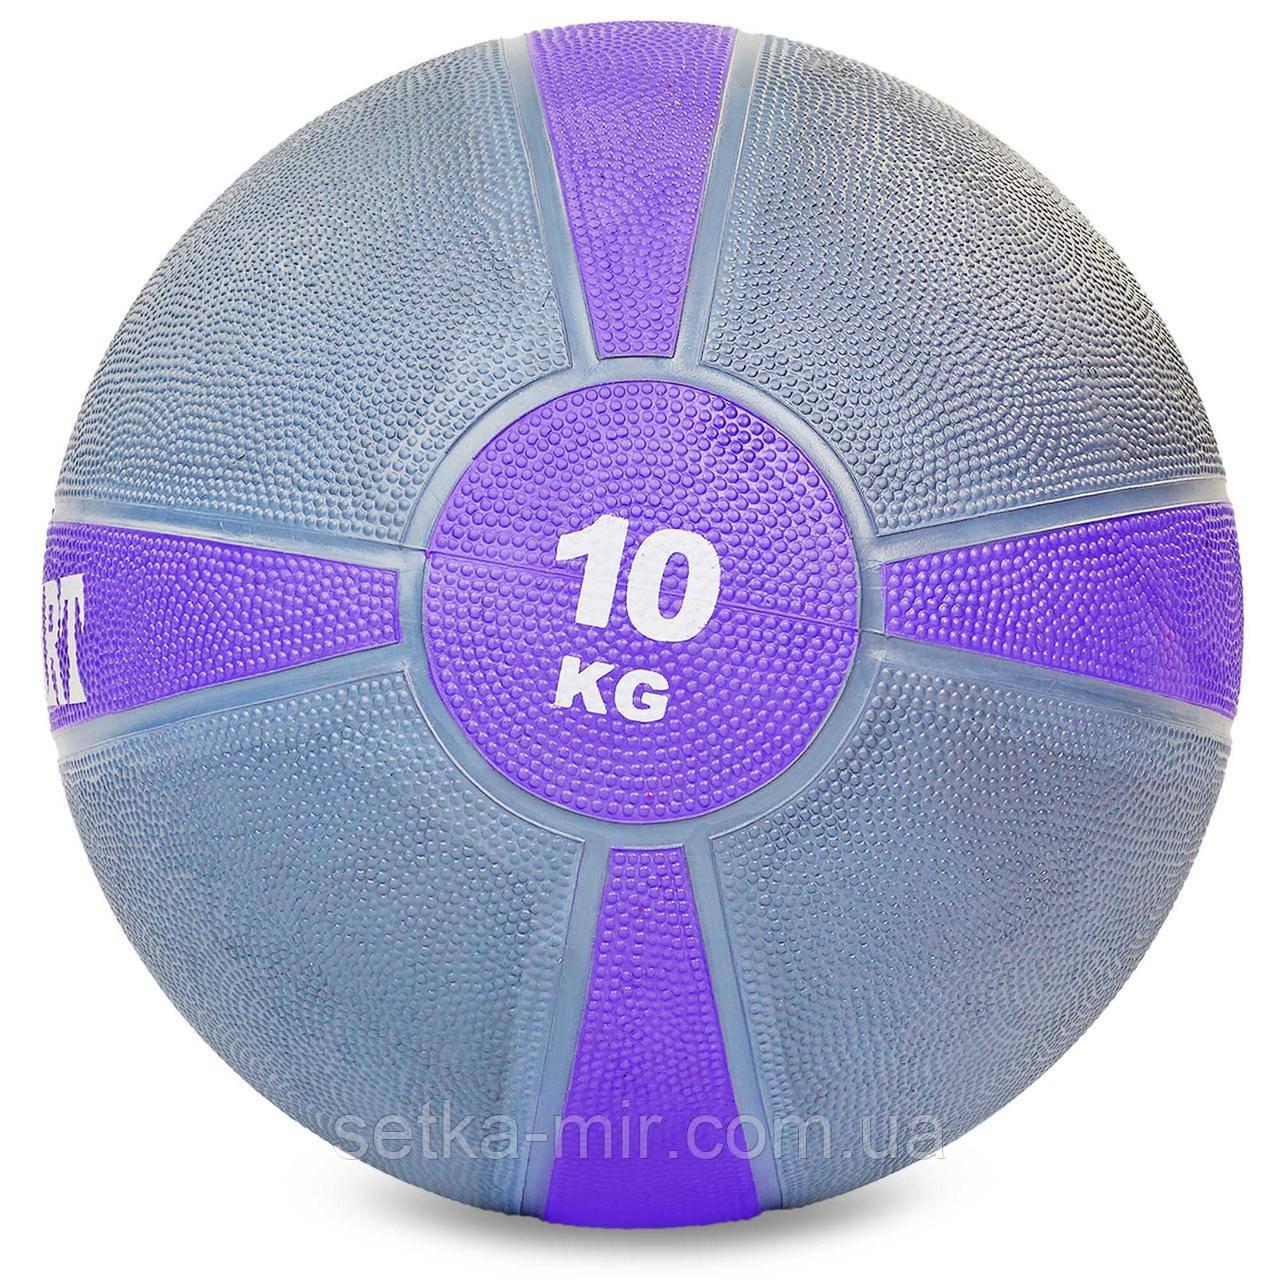 Мяч медицинский медбол Zelart Medicine Ball FI-5122-10 10кг